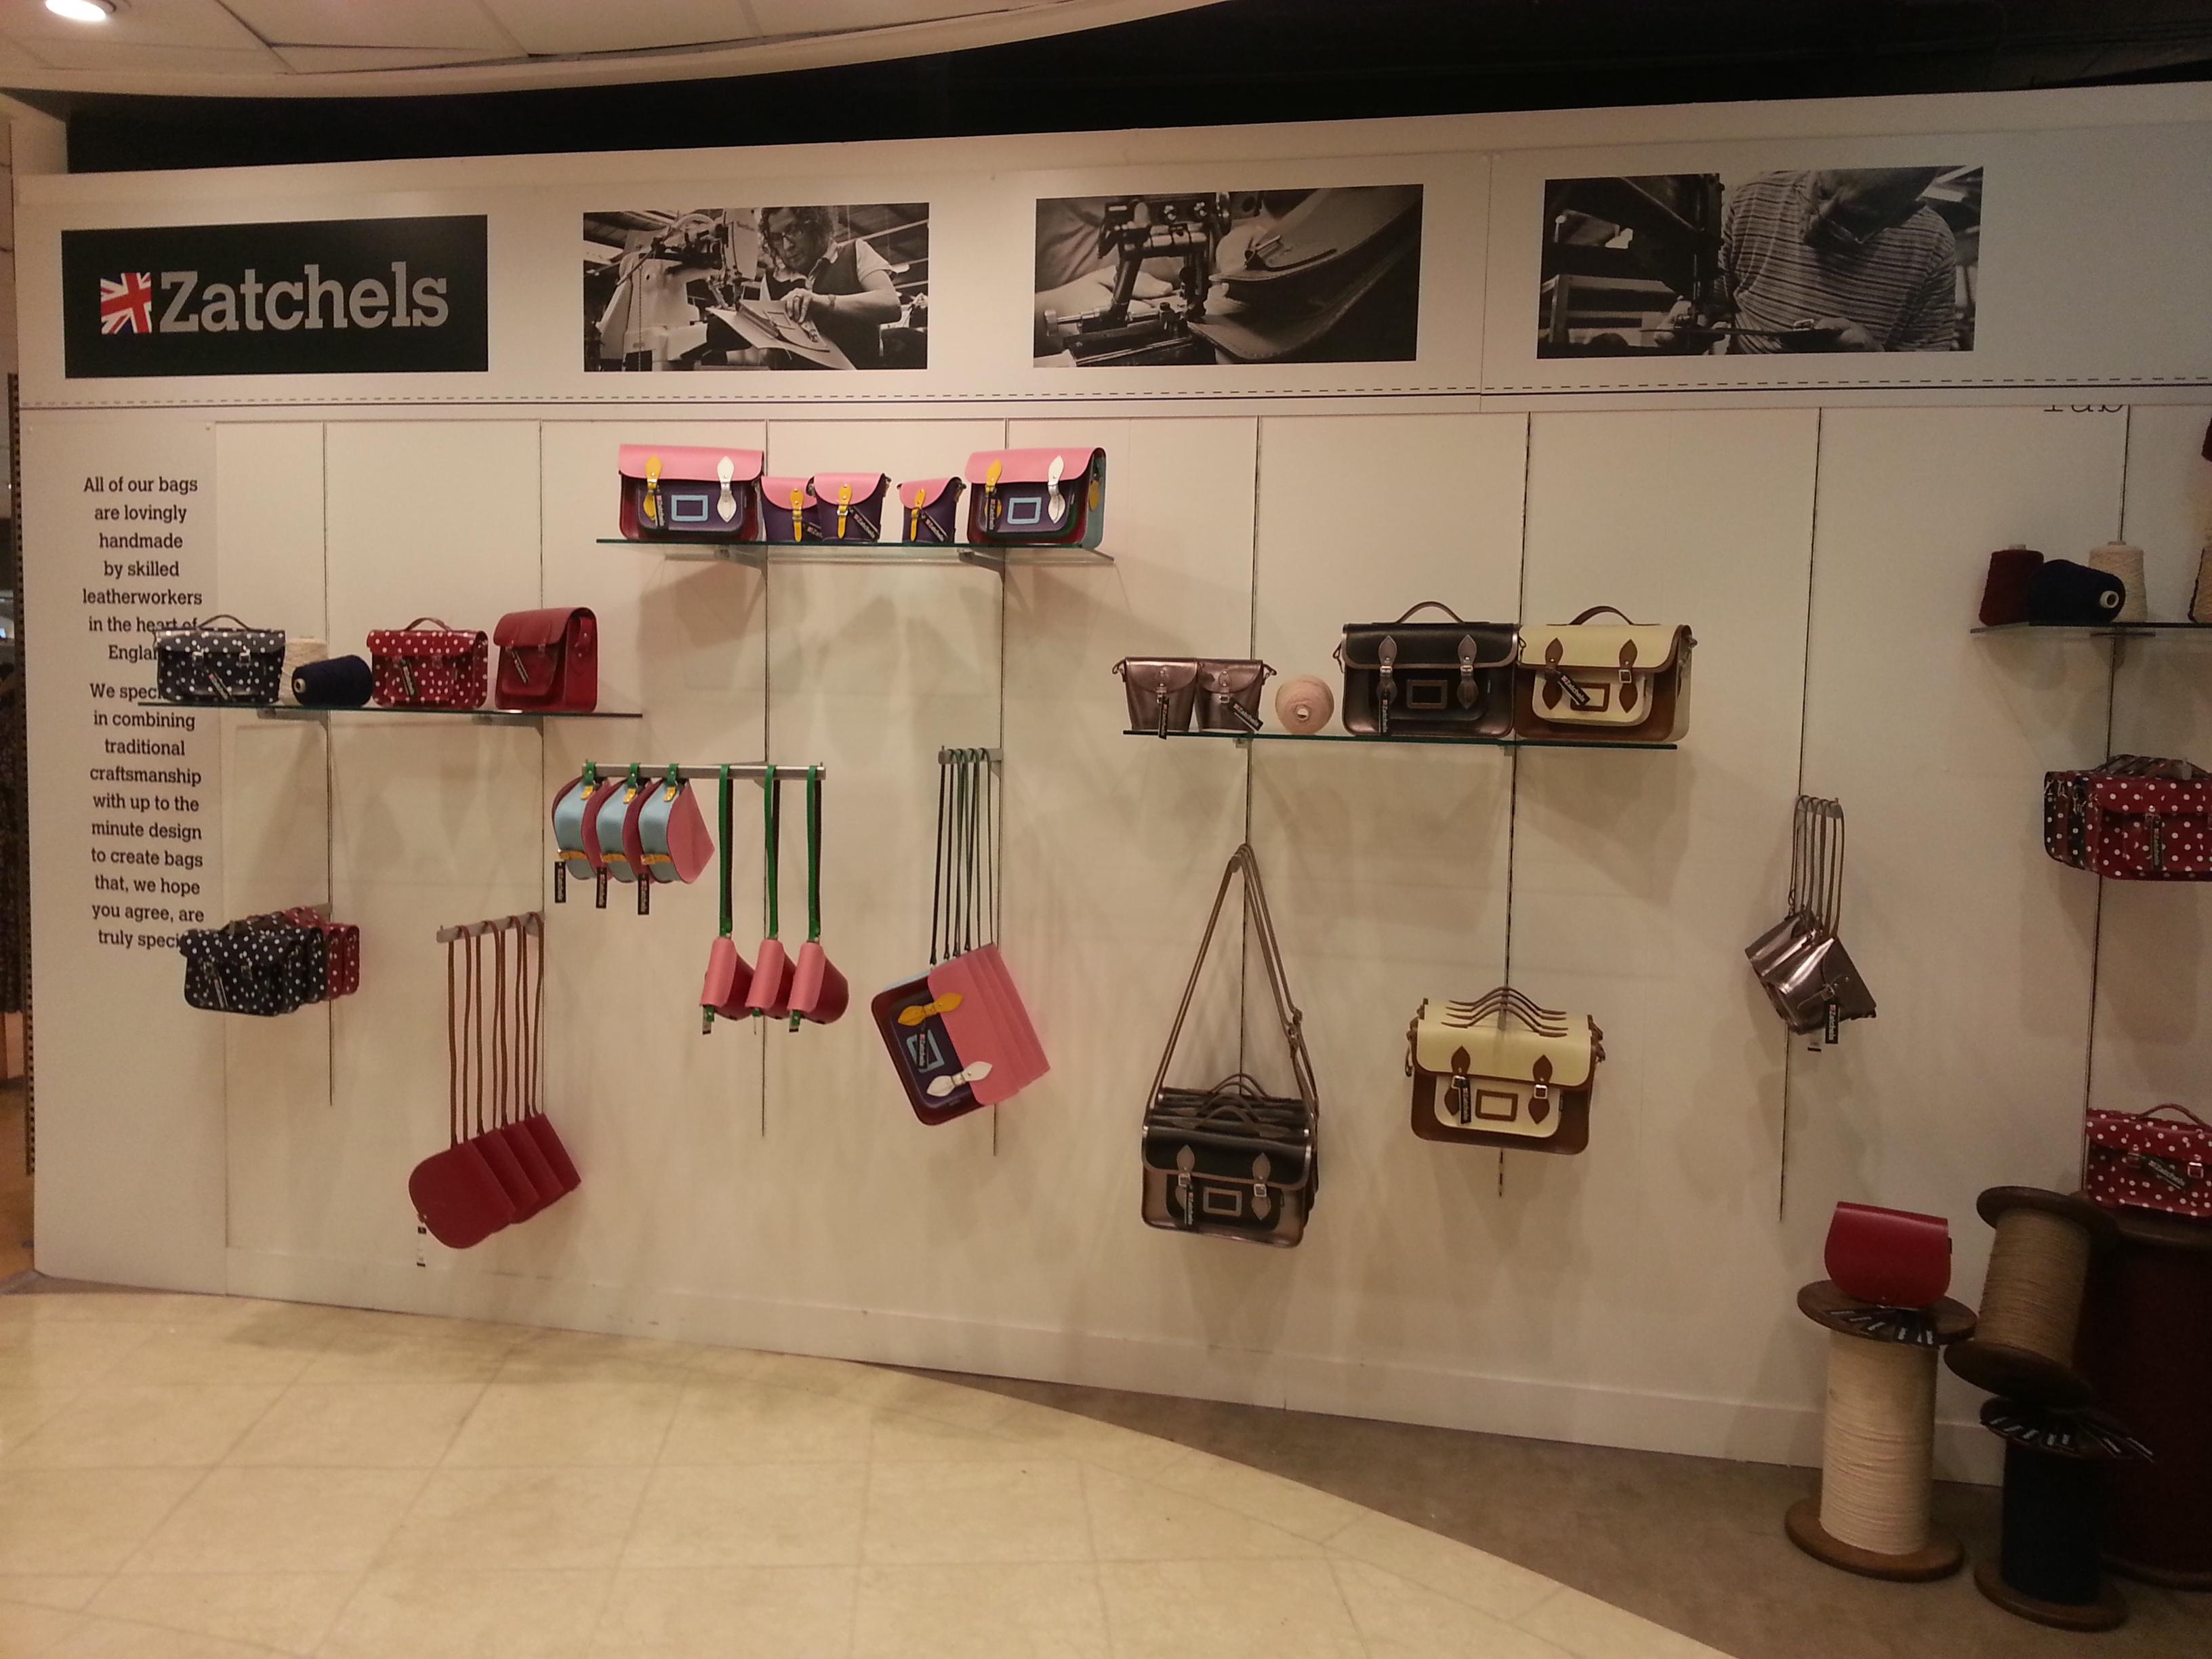 London Shopping | Handbags at Harrods Gift Shop London Blog